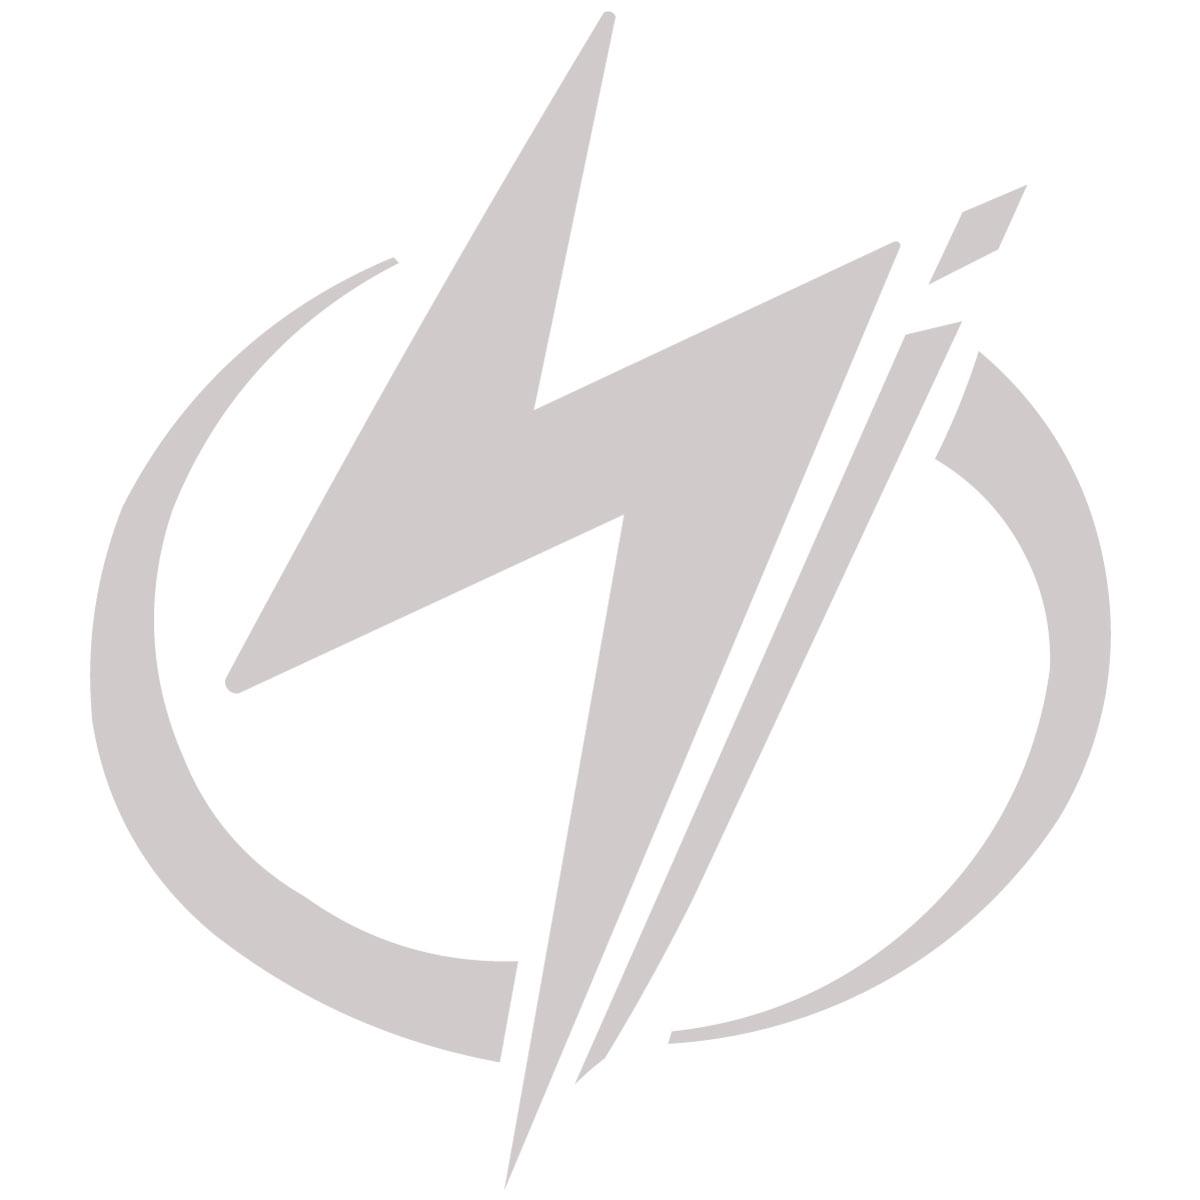 SiForce Lightning NVX